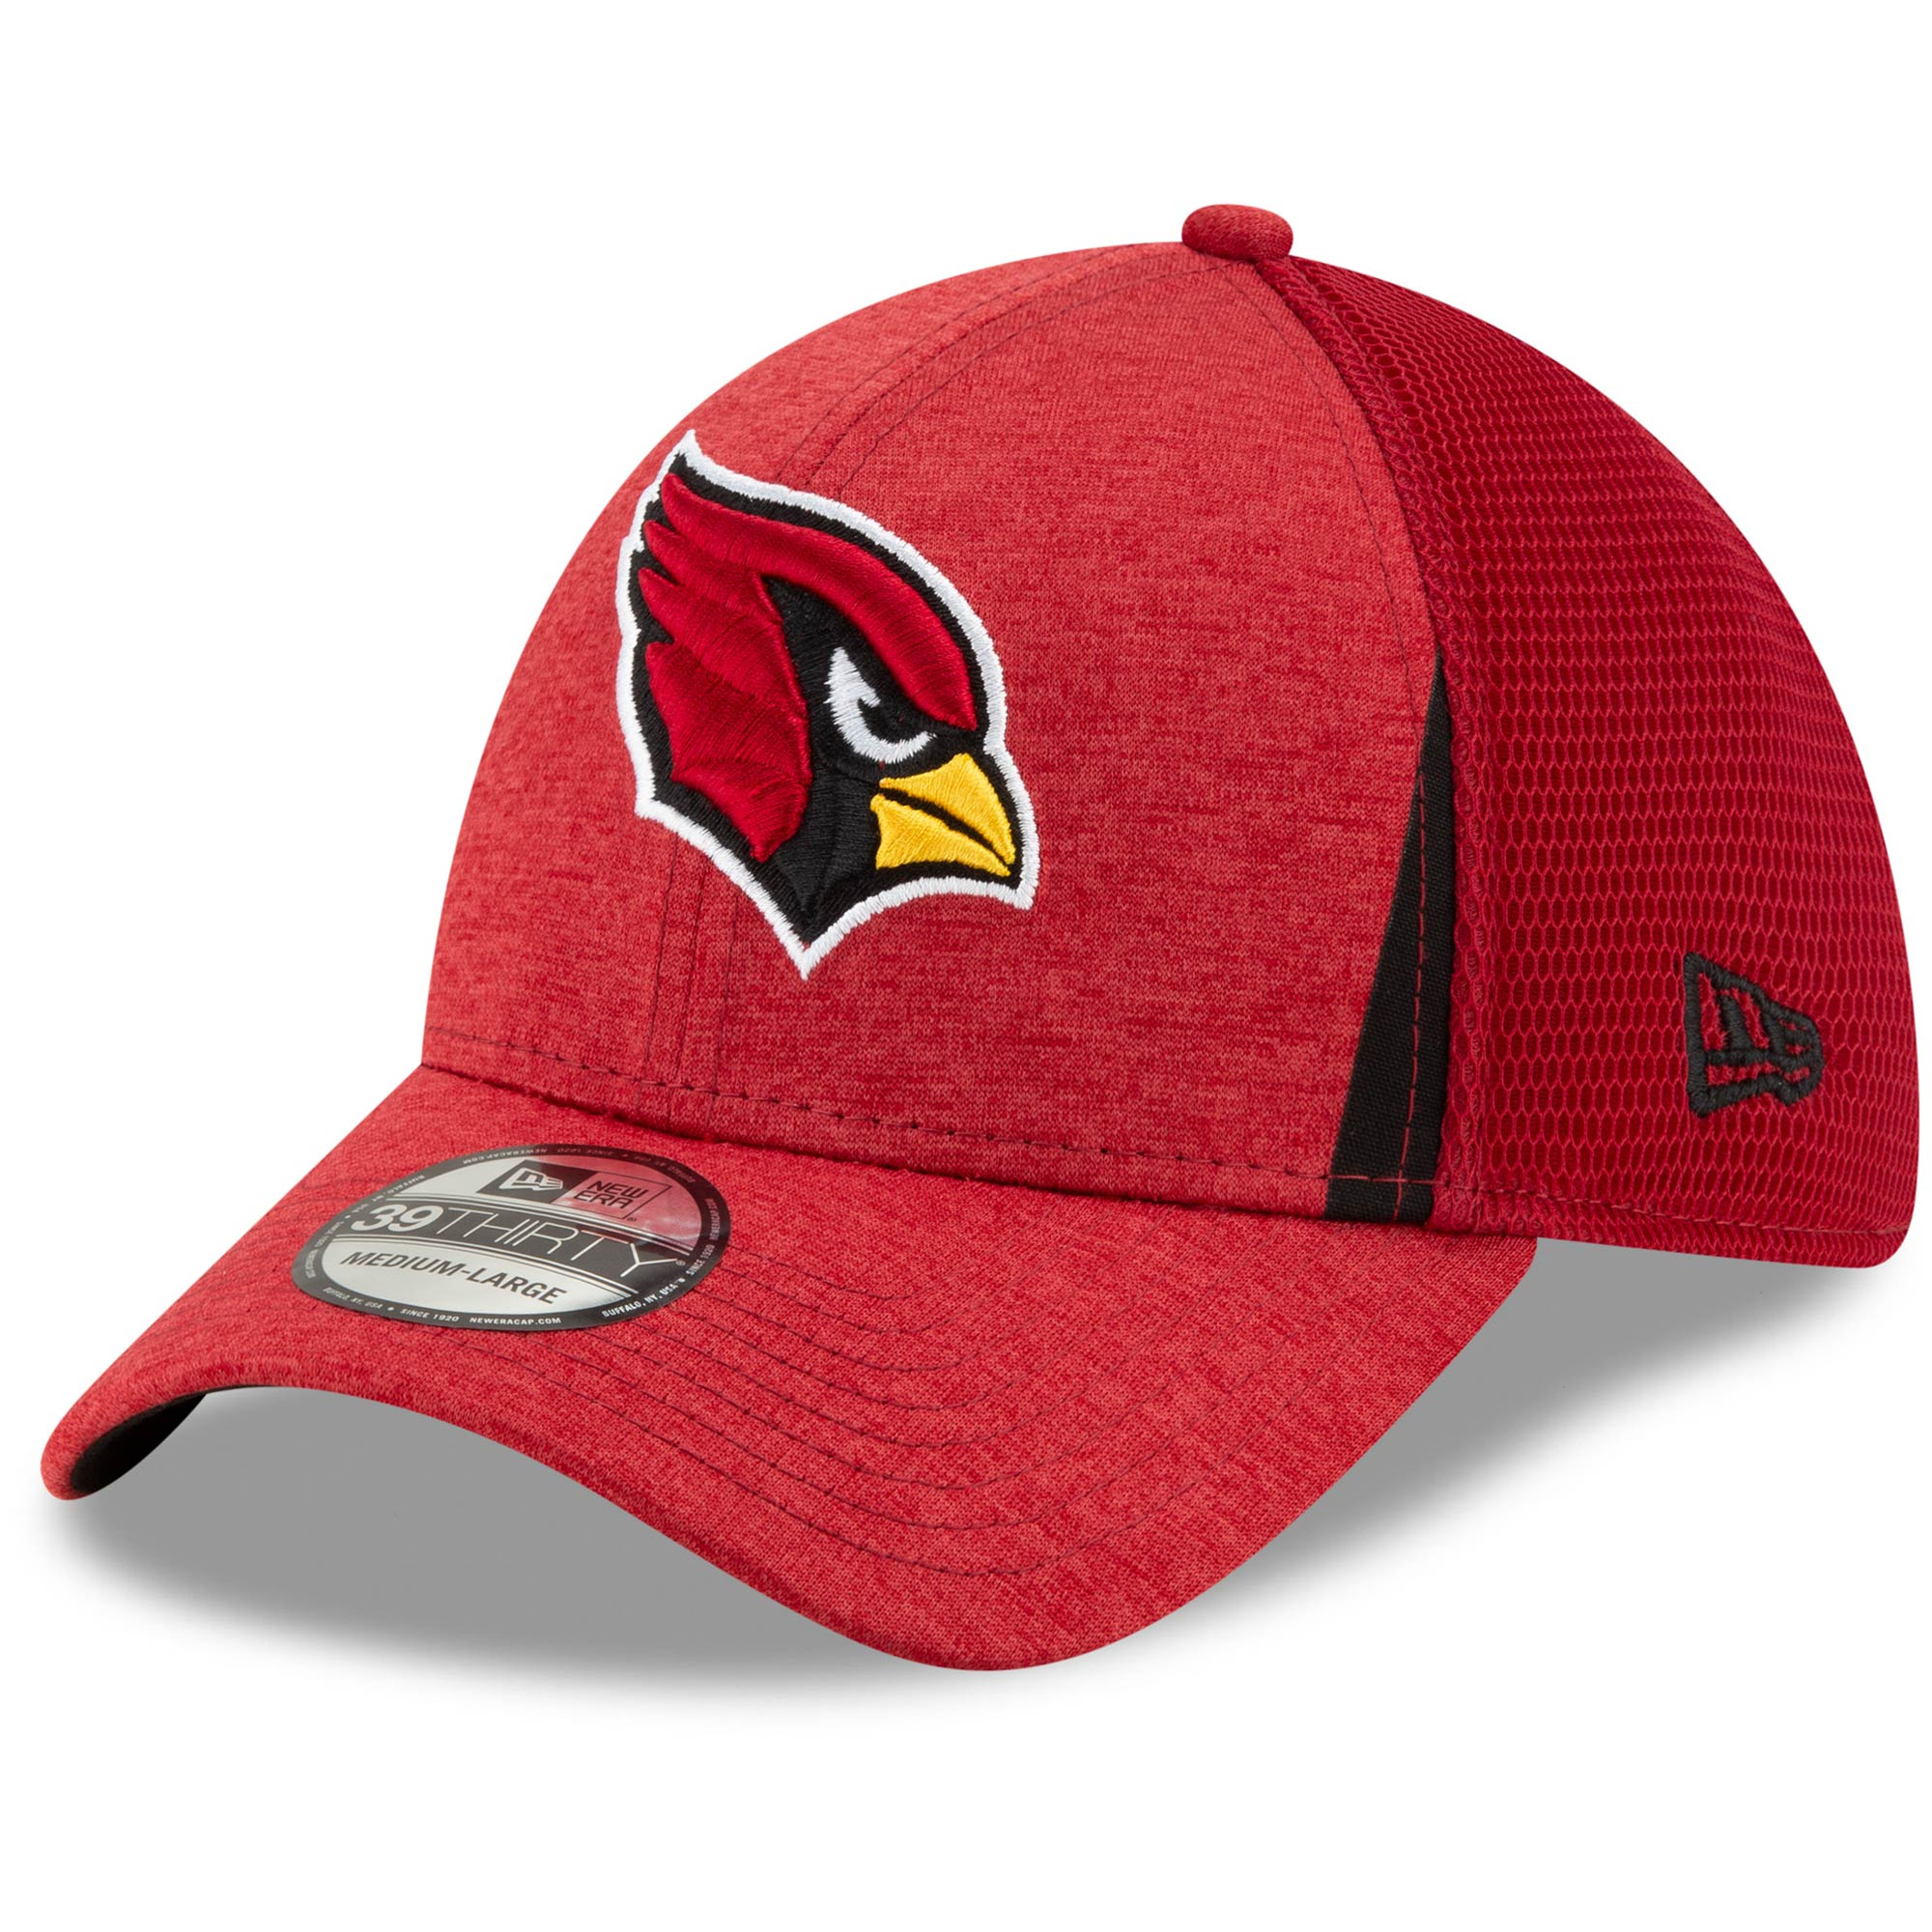 Arizona Cardinals New Era Slice Neo 39THIRTY Flex Hat - Cardinal